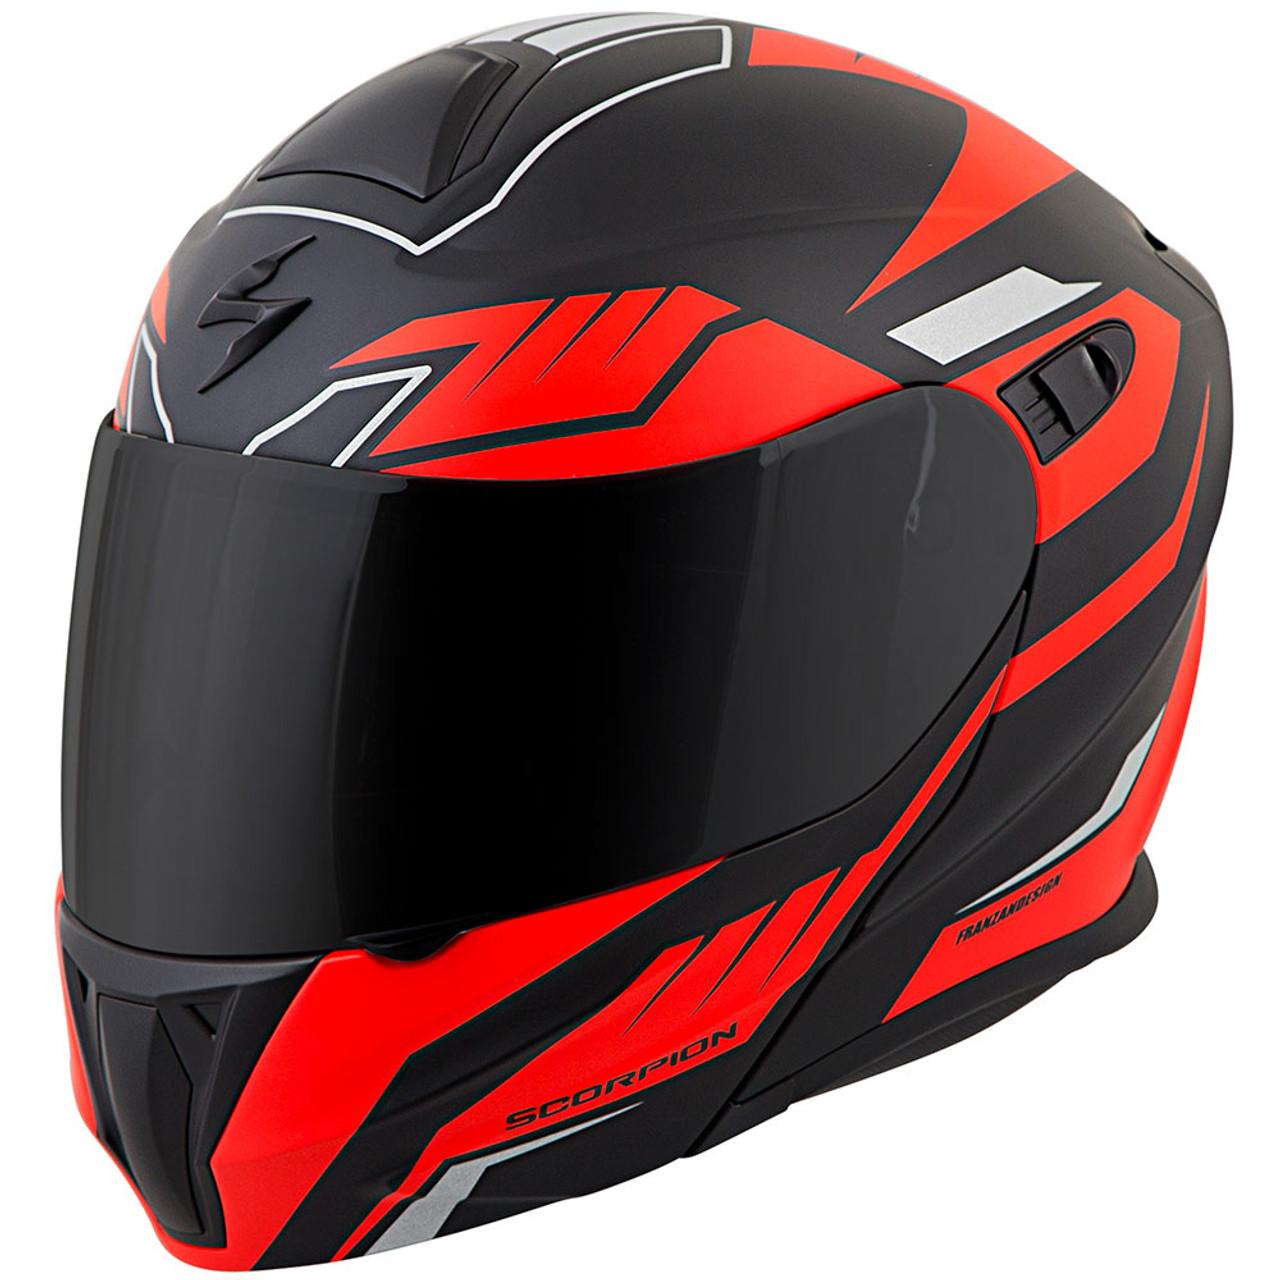 9a2732b1 Scorpion EXO-GT920 Satellite Modular Motorcycle Helmet - Get Lowered ...